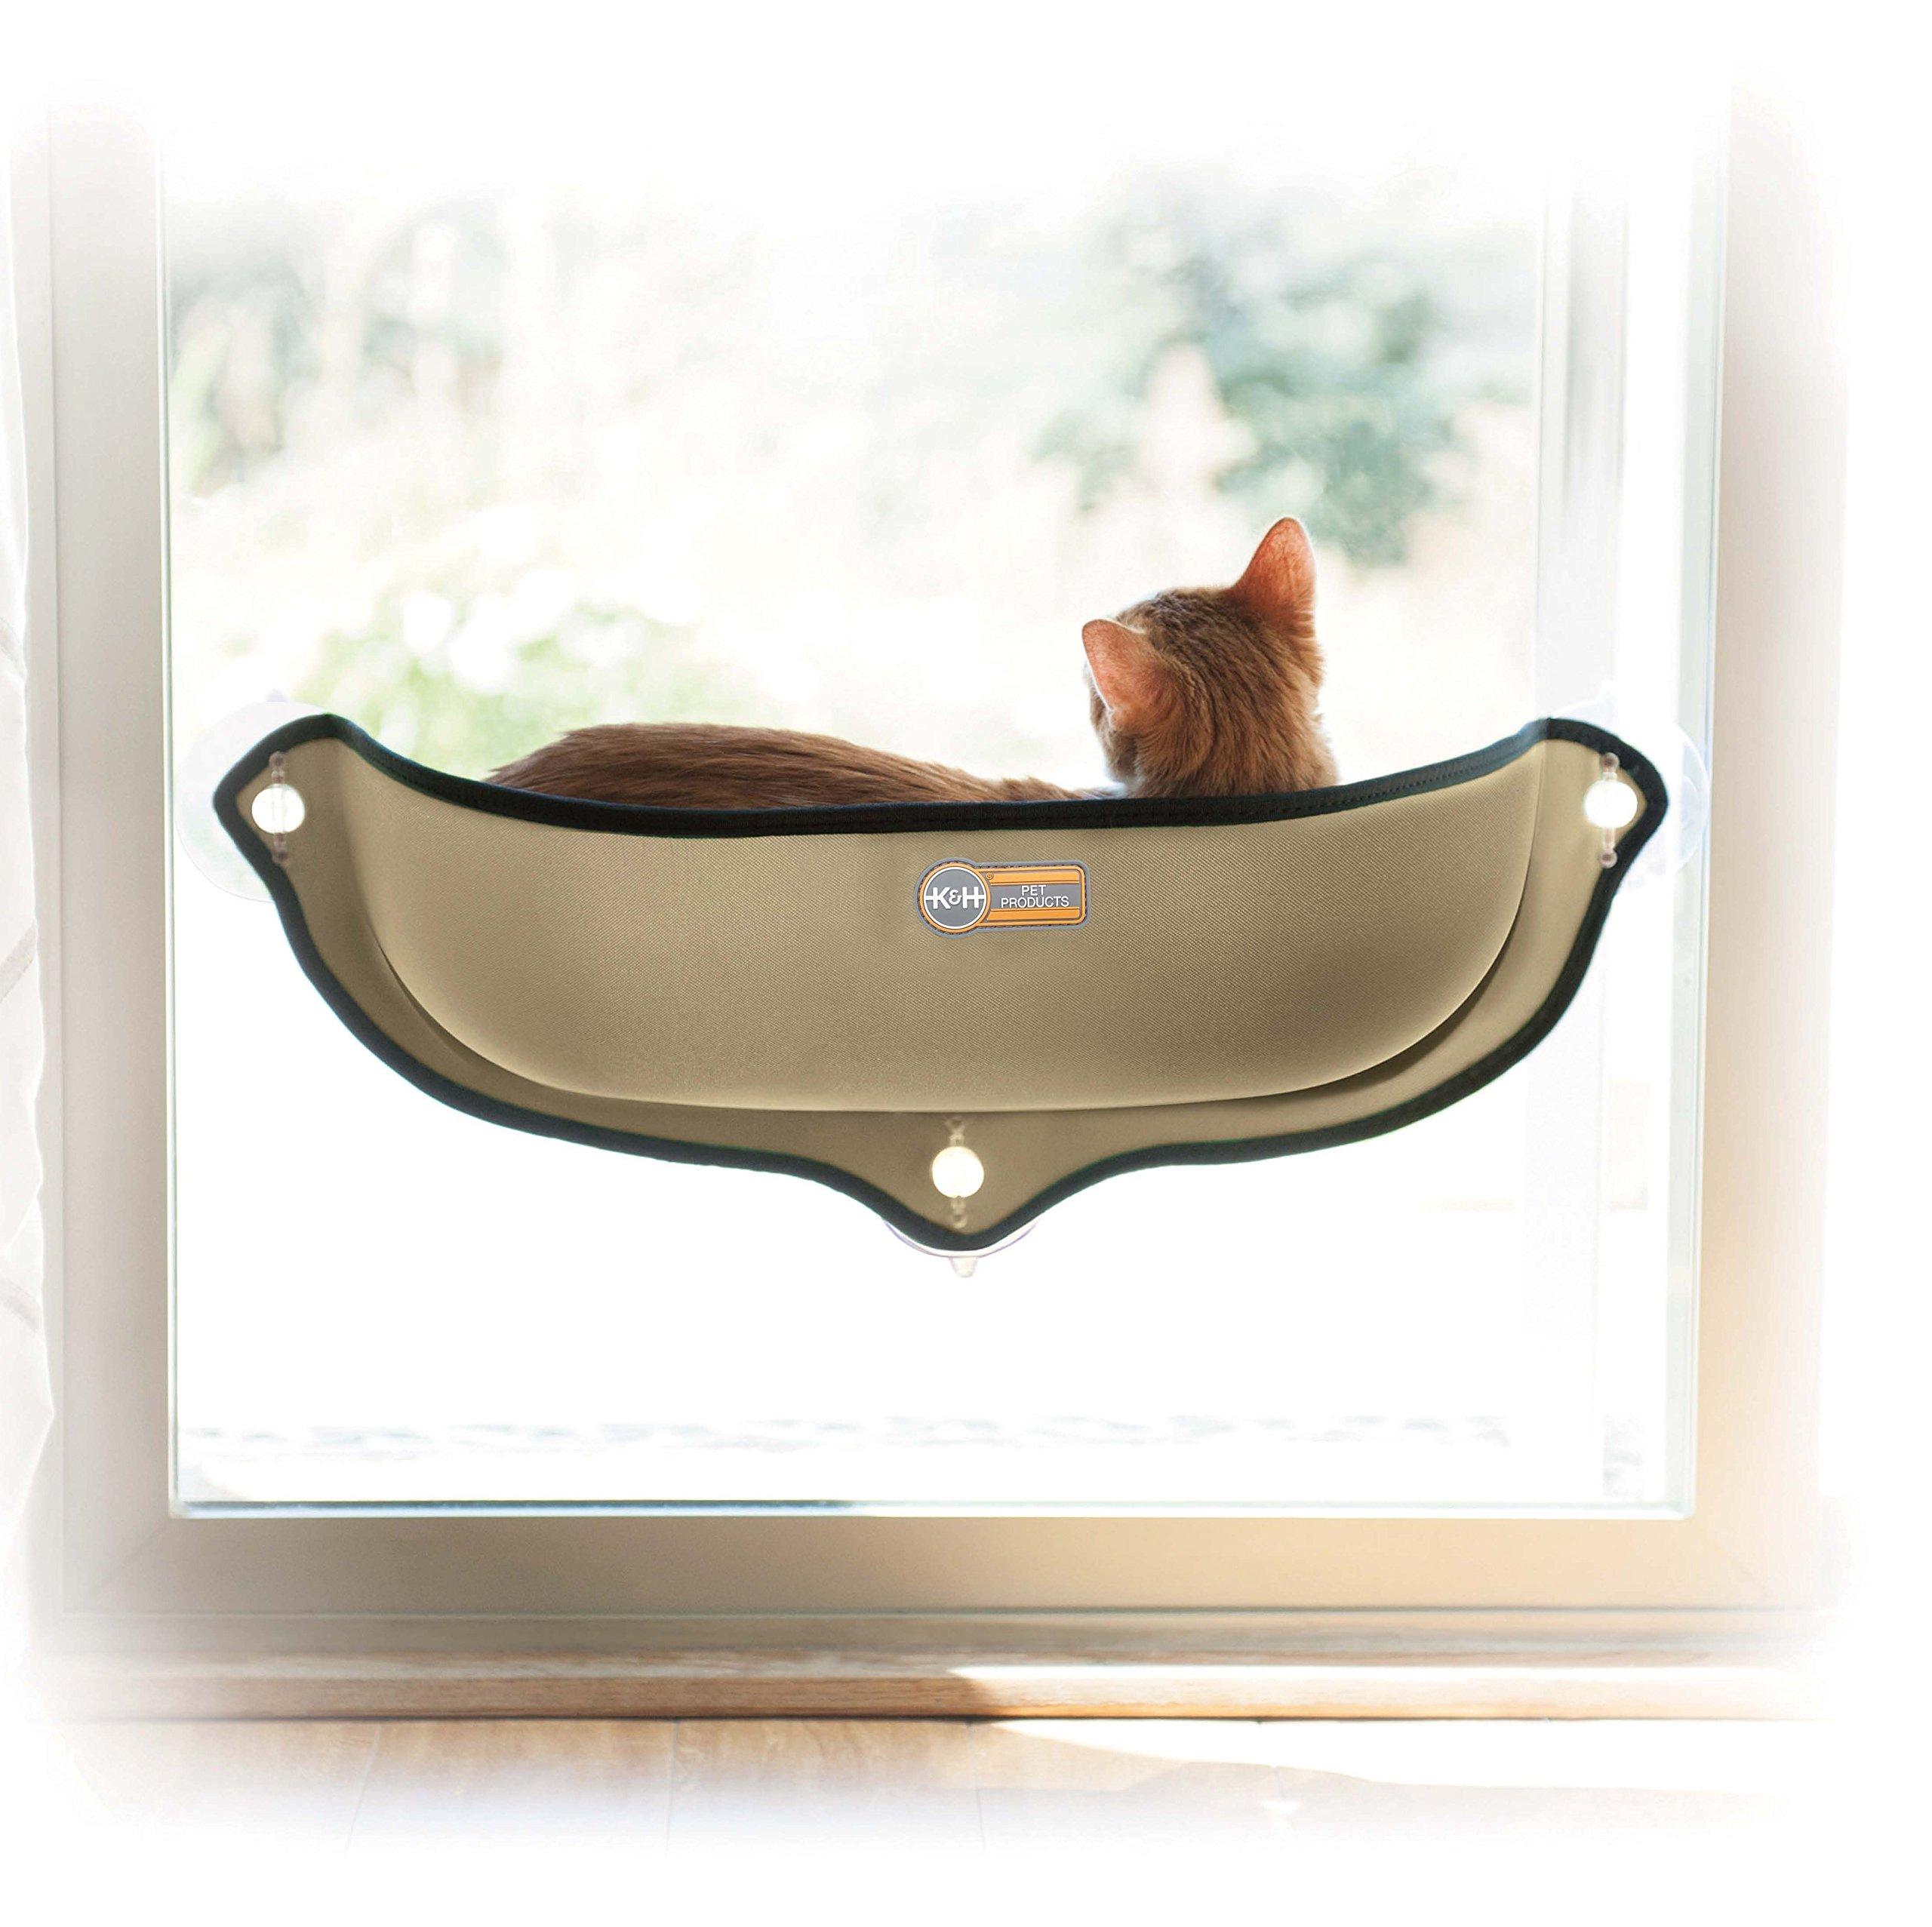 K&H Pet Products EZ Mount Window Bed Kitty Sill Tan 27'' x 11''